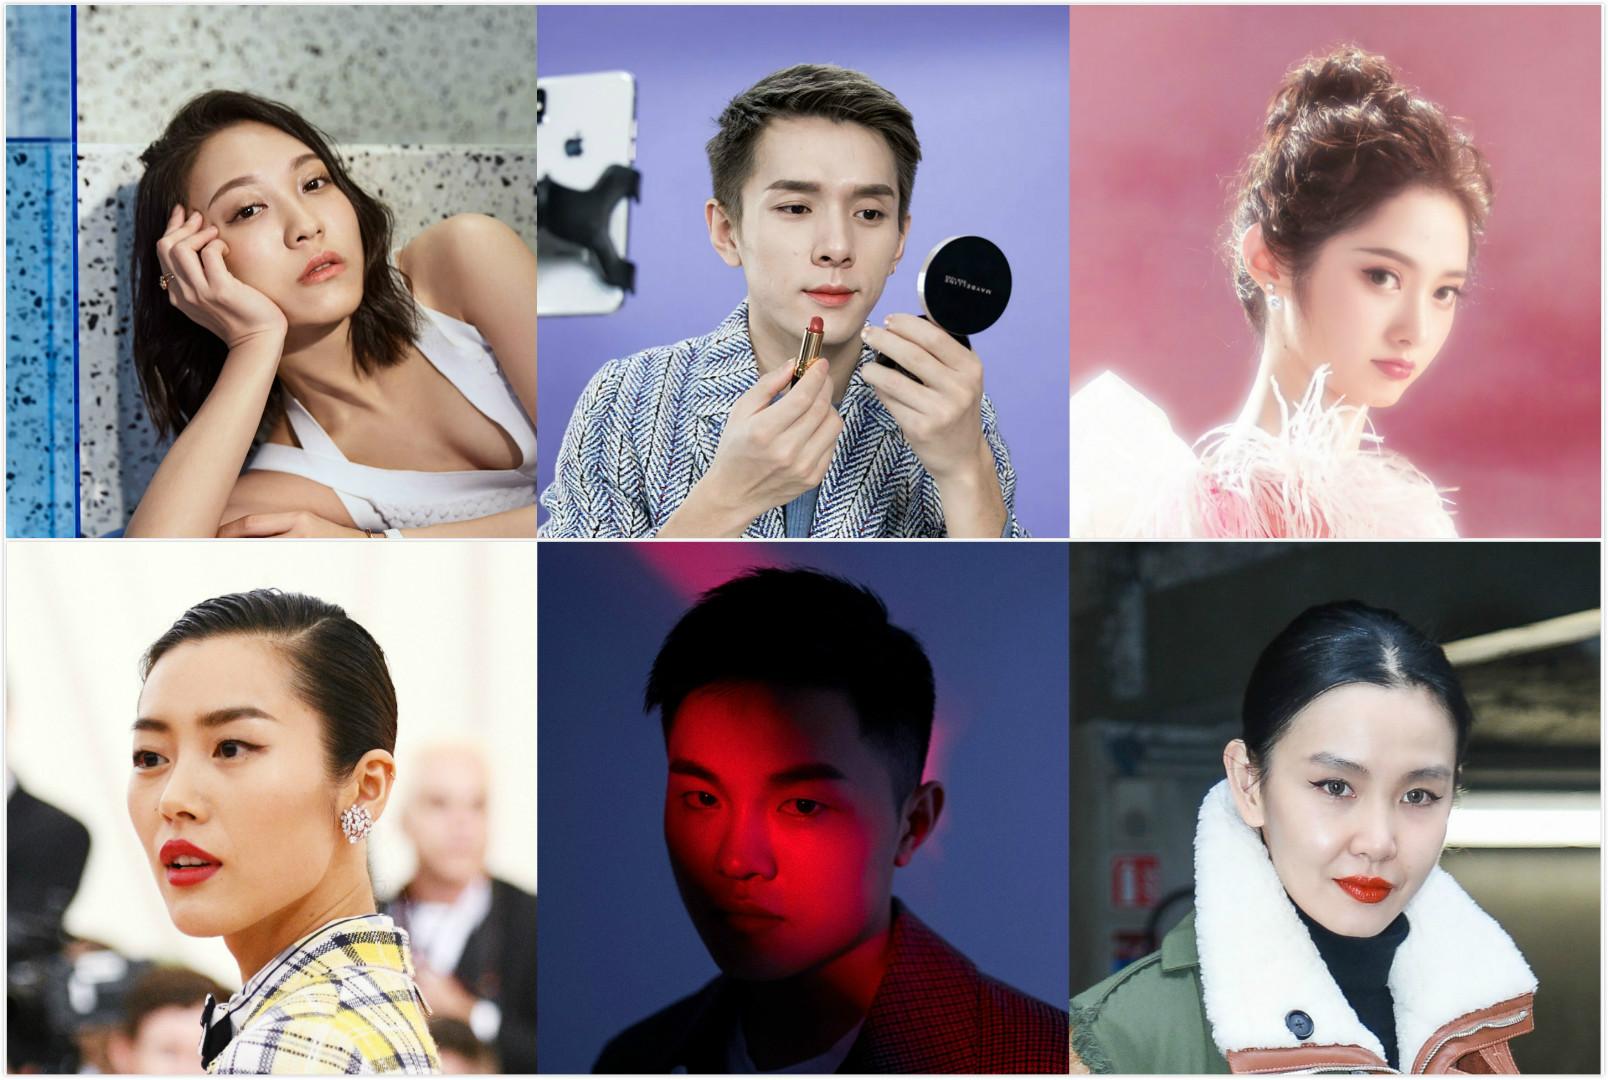 Top, from left to right, Anny Fan, Austin Li and Rita Wang. Bottom, from left to right, Liu Wen, Yu Zheng and Sherry Shen